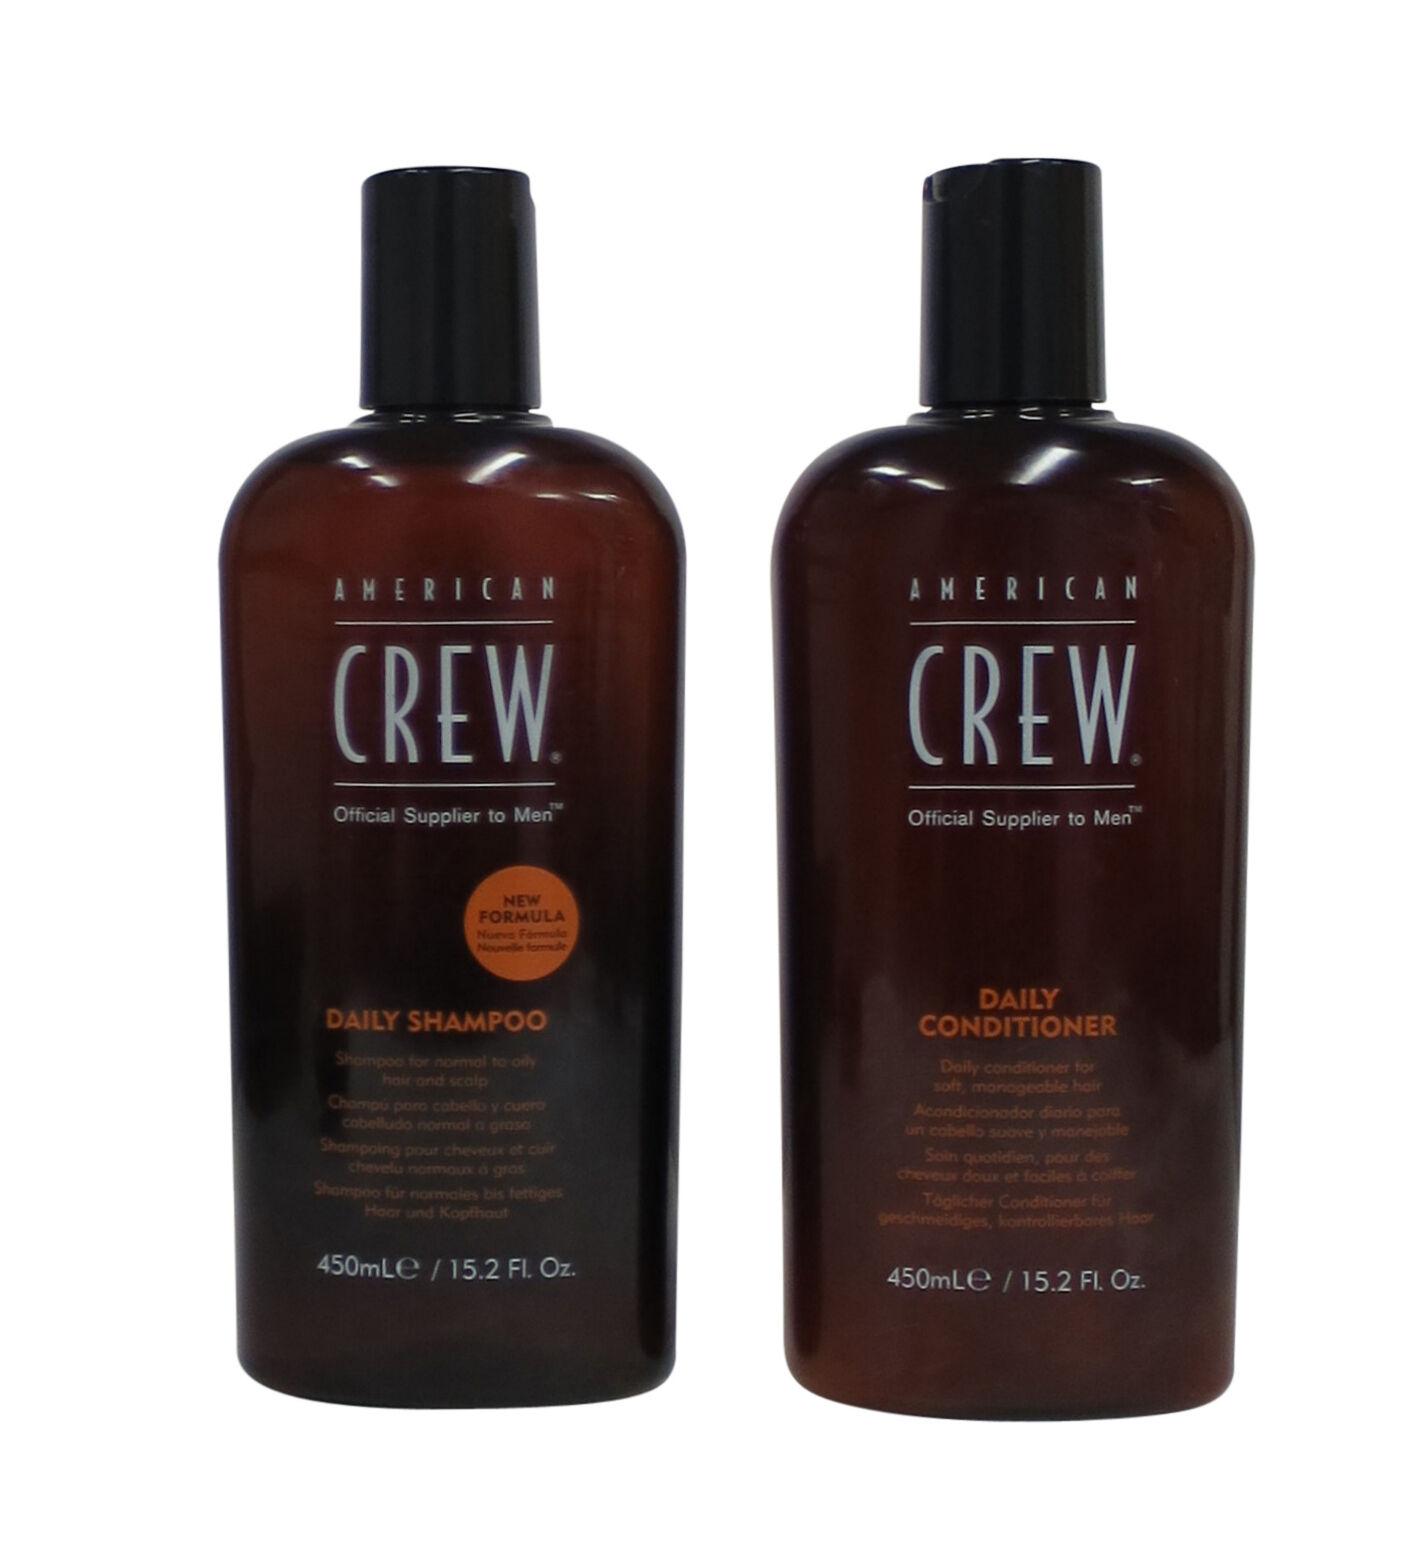 American Crew Daily Shampoo - 15.2 oz